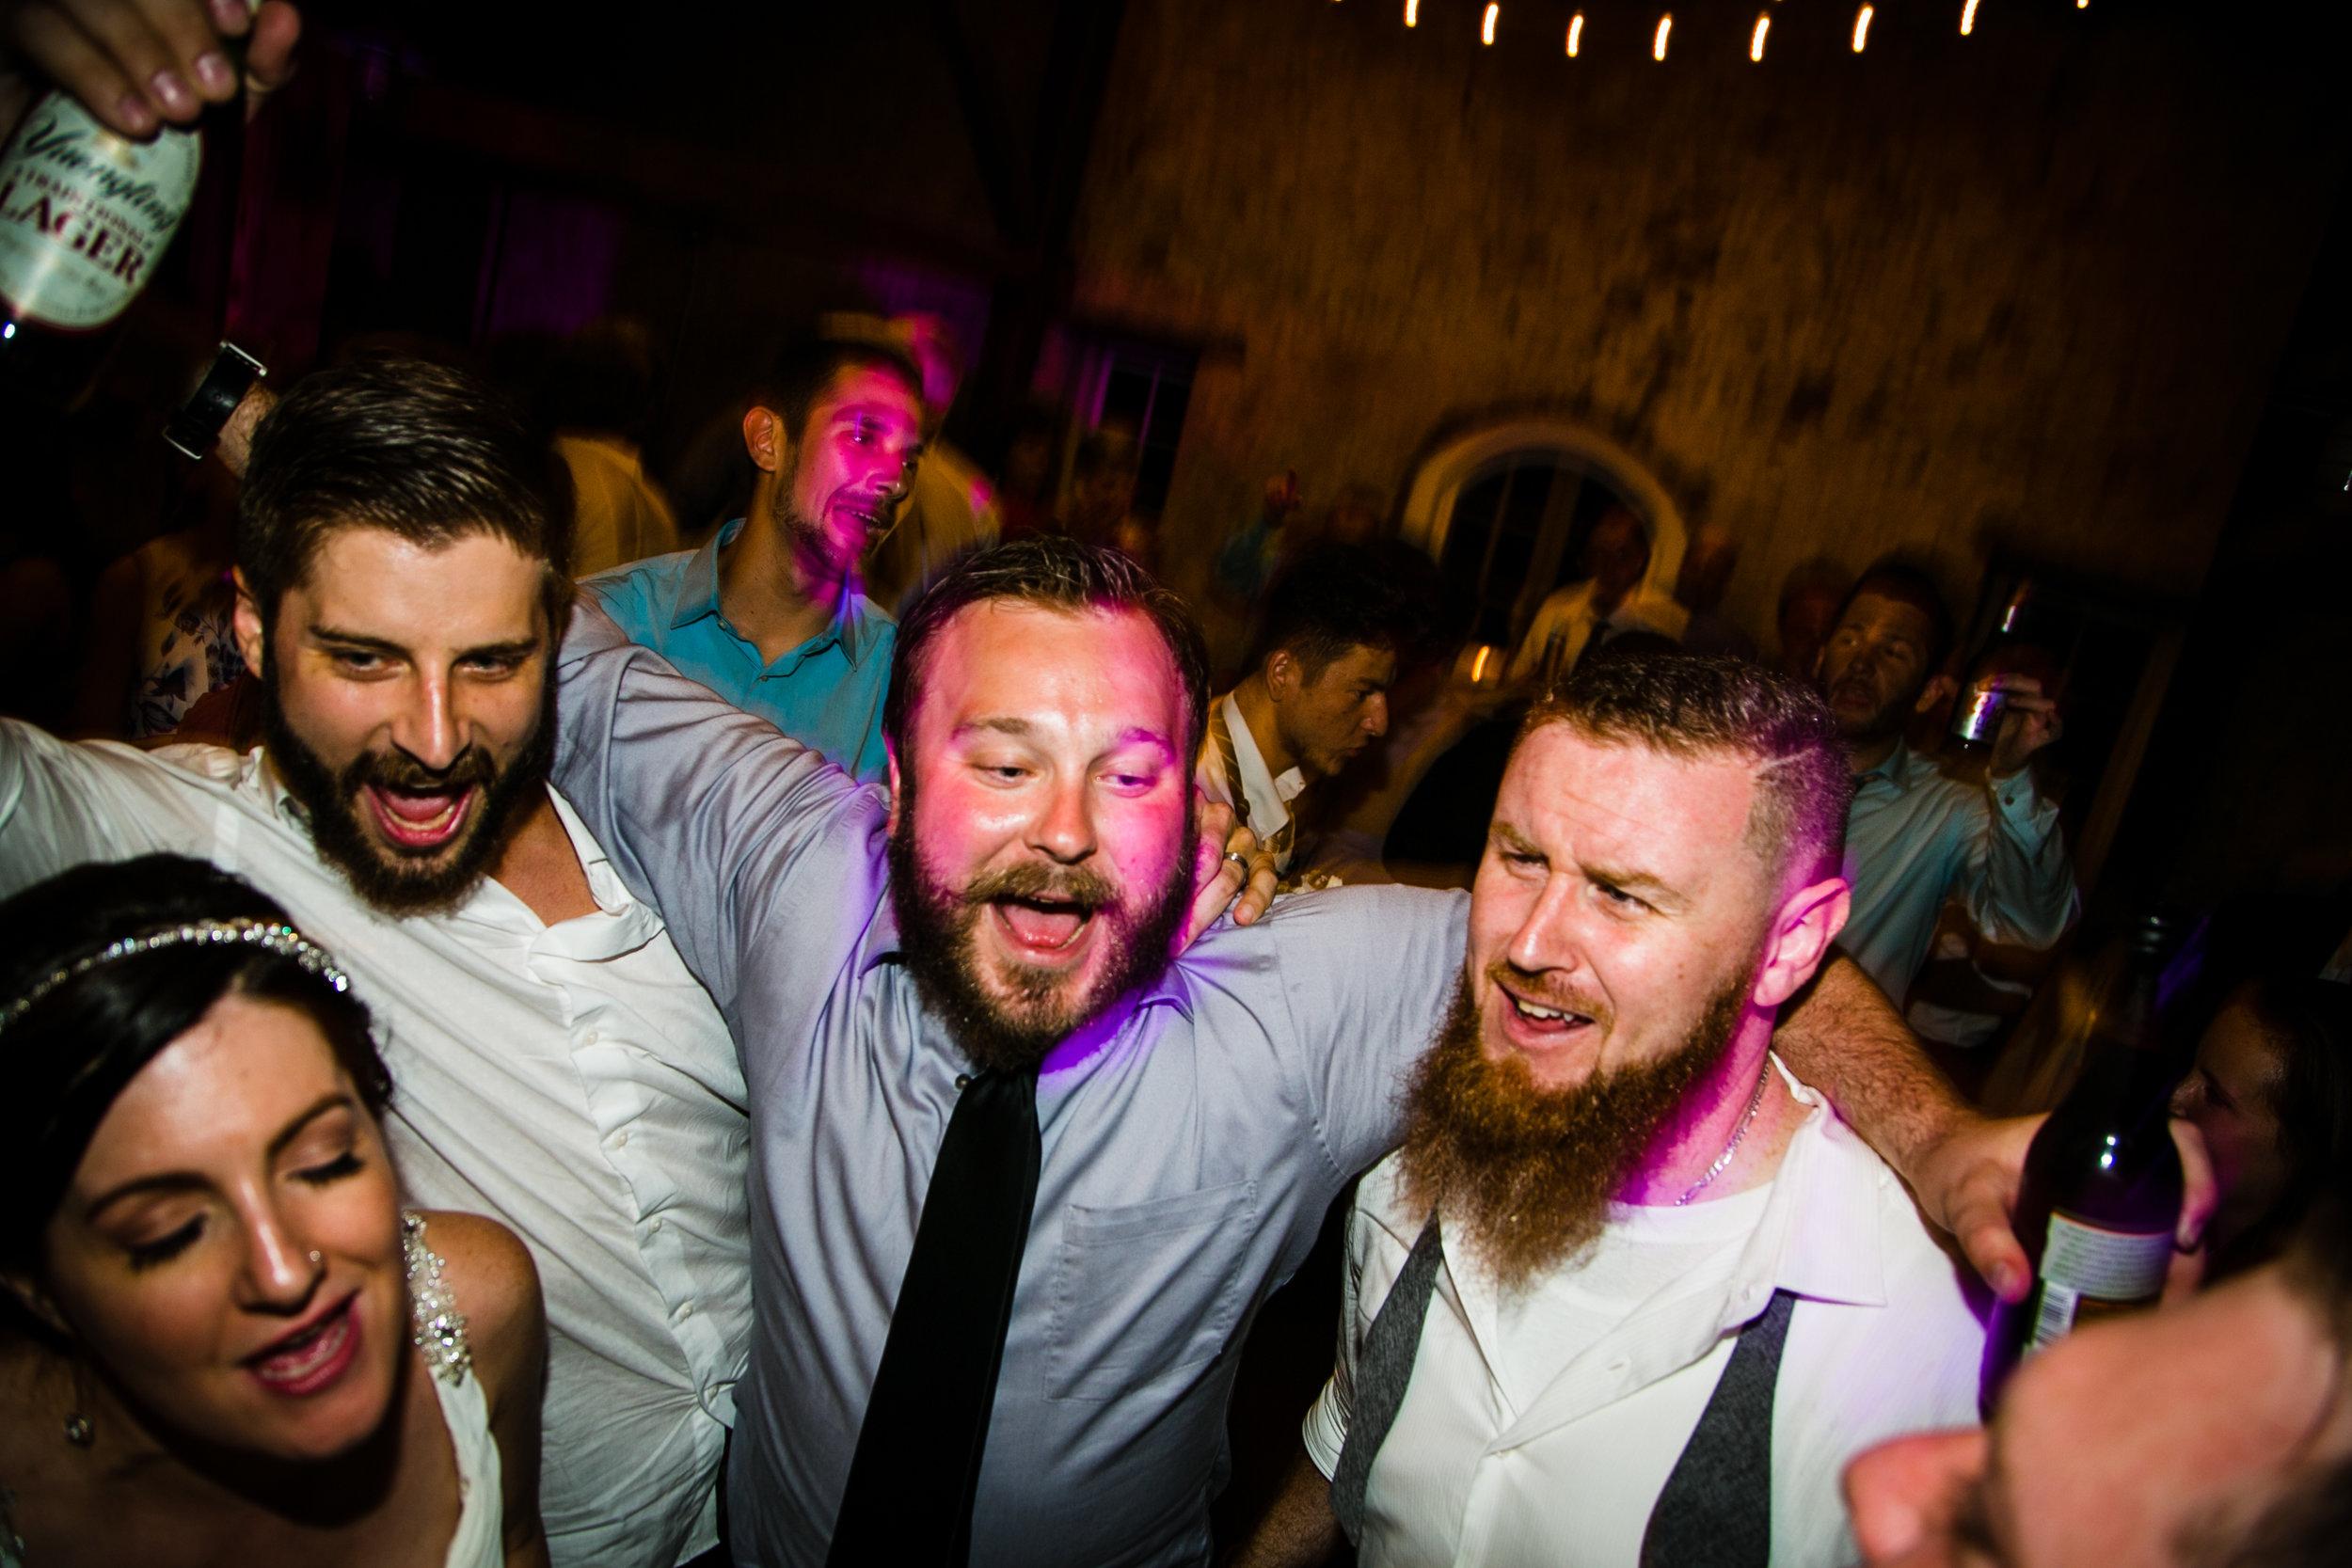 TYLER ARBORETUM WEDDING PHOTOGRAPHY LOVESTRUCK PICTURES-110.jpg